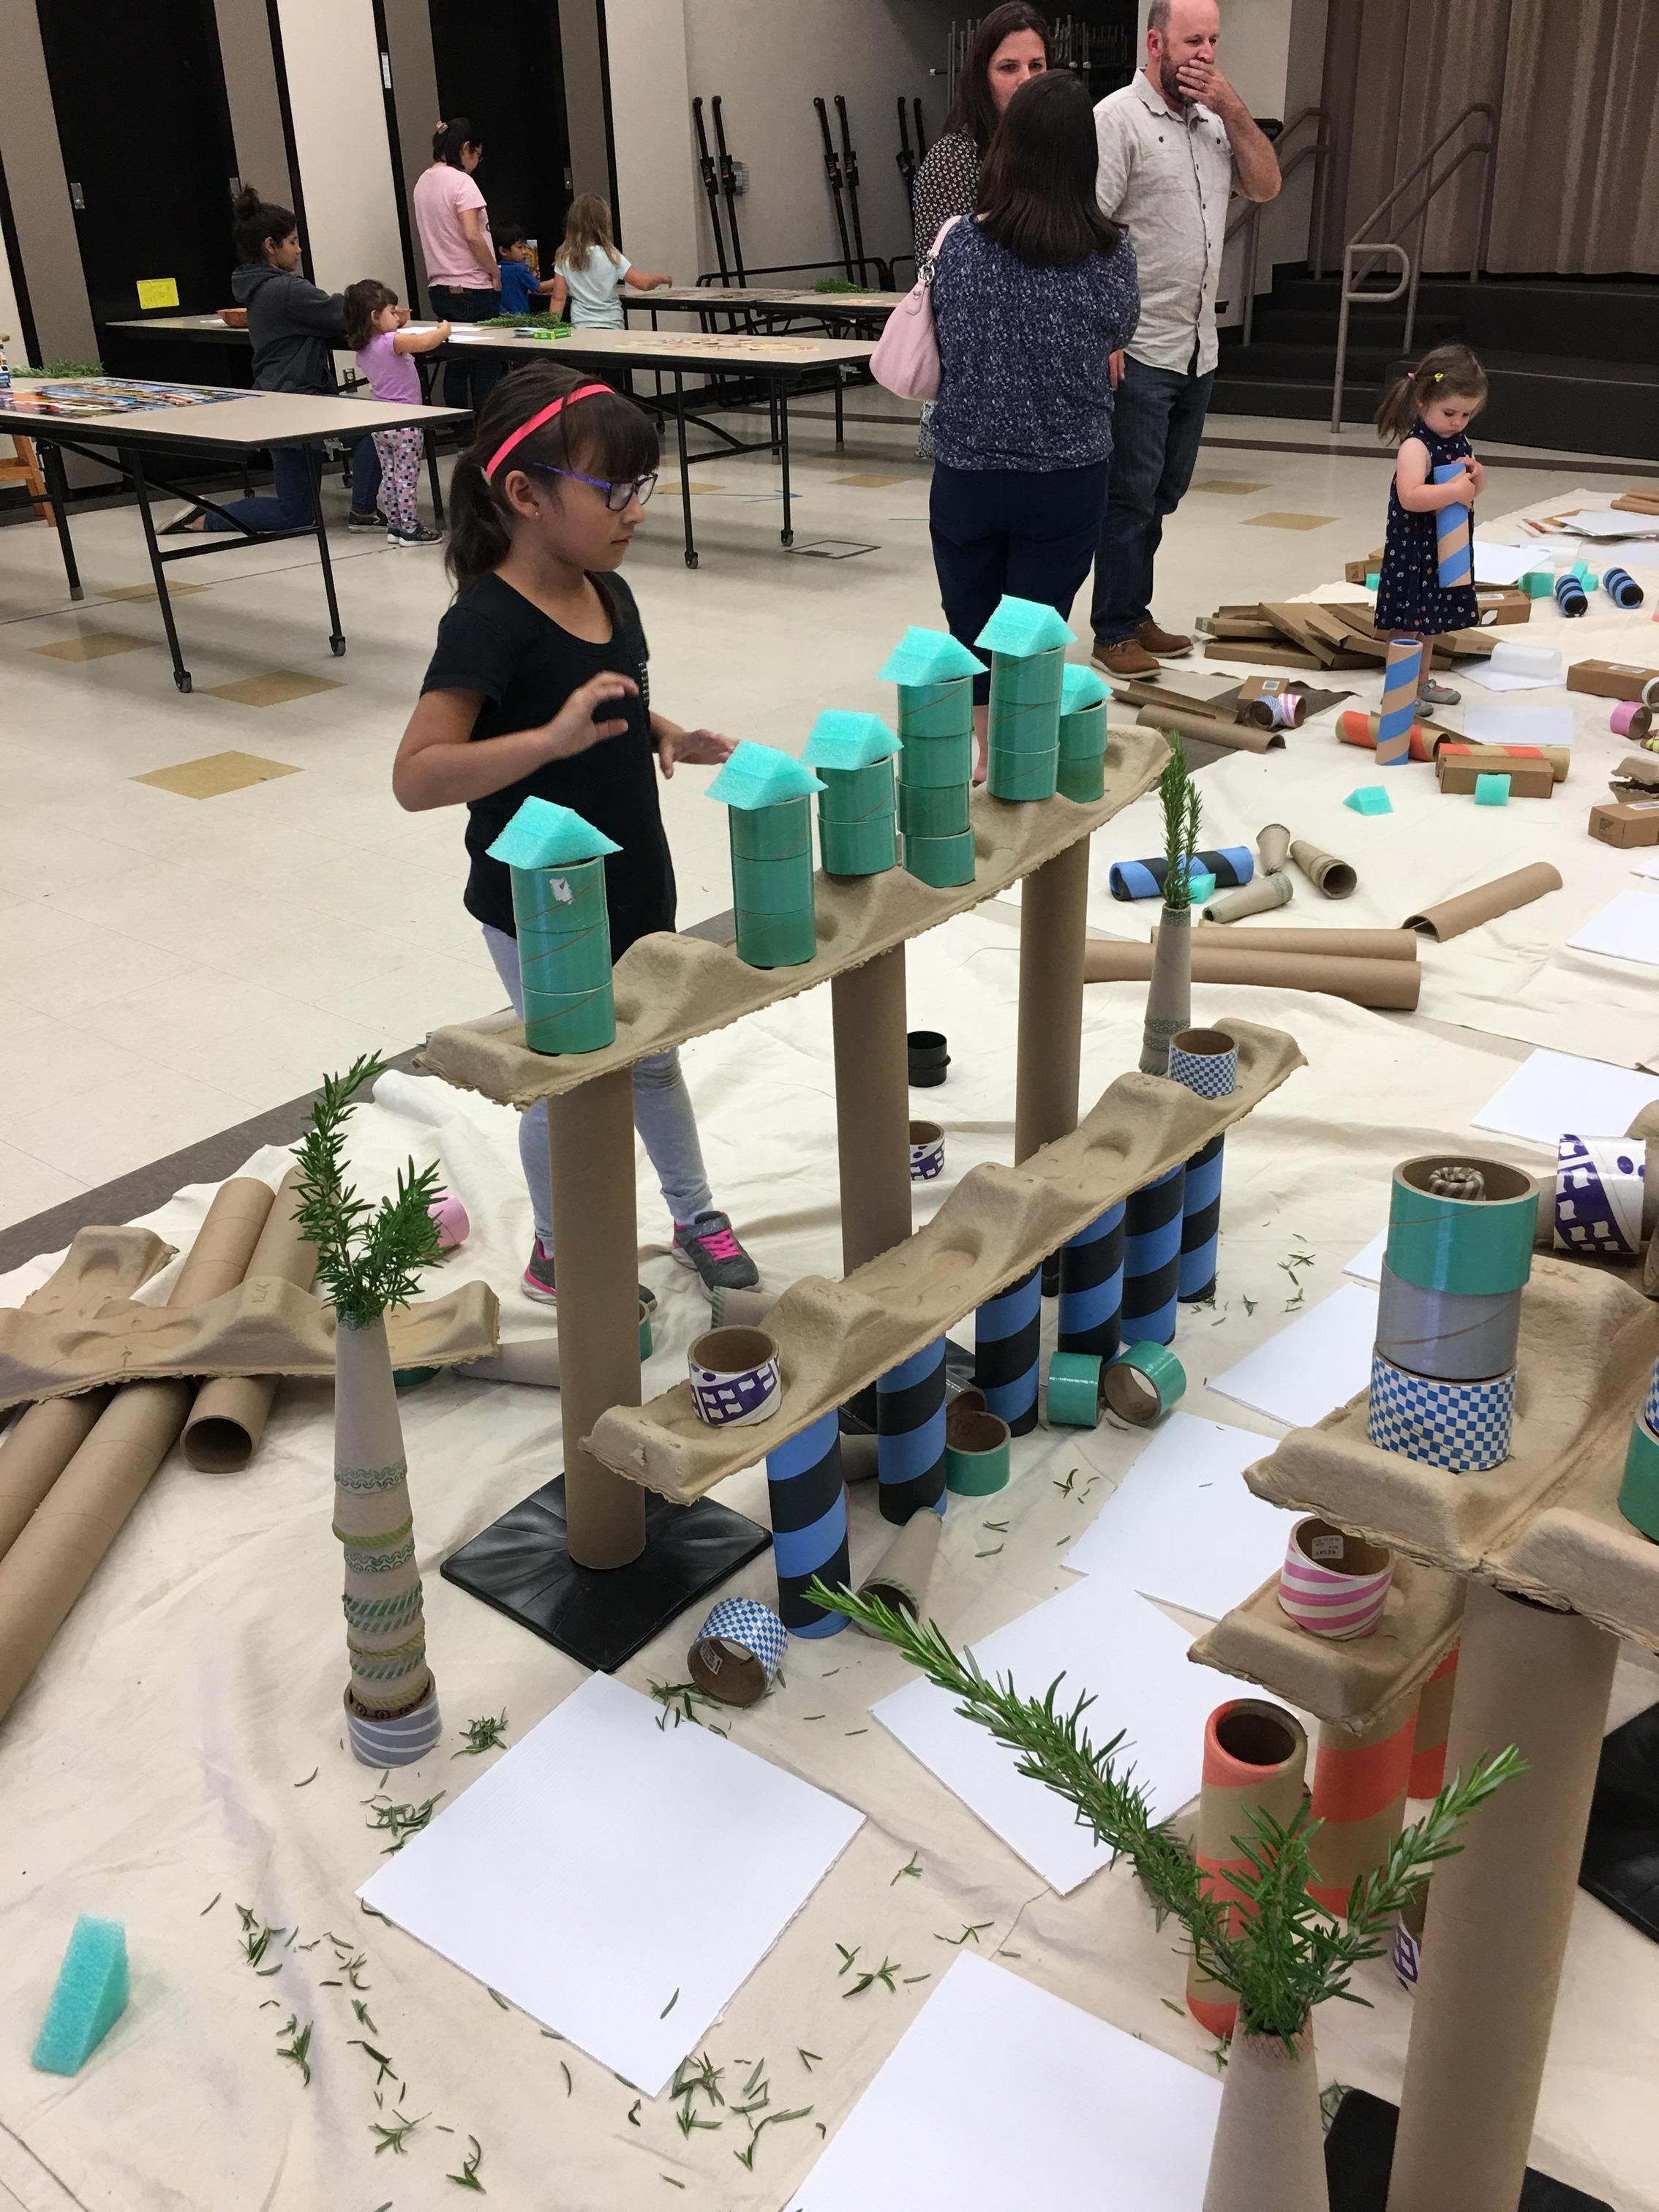 children building bridges with cardboard and blocks